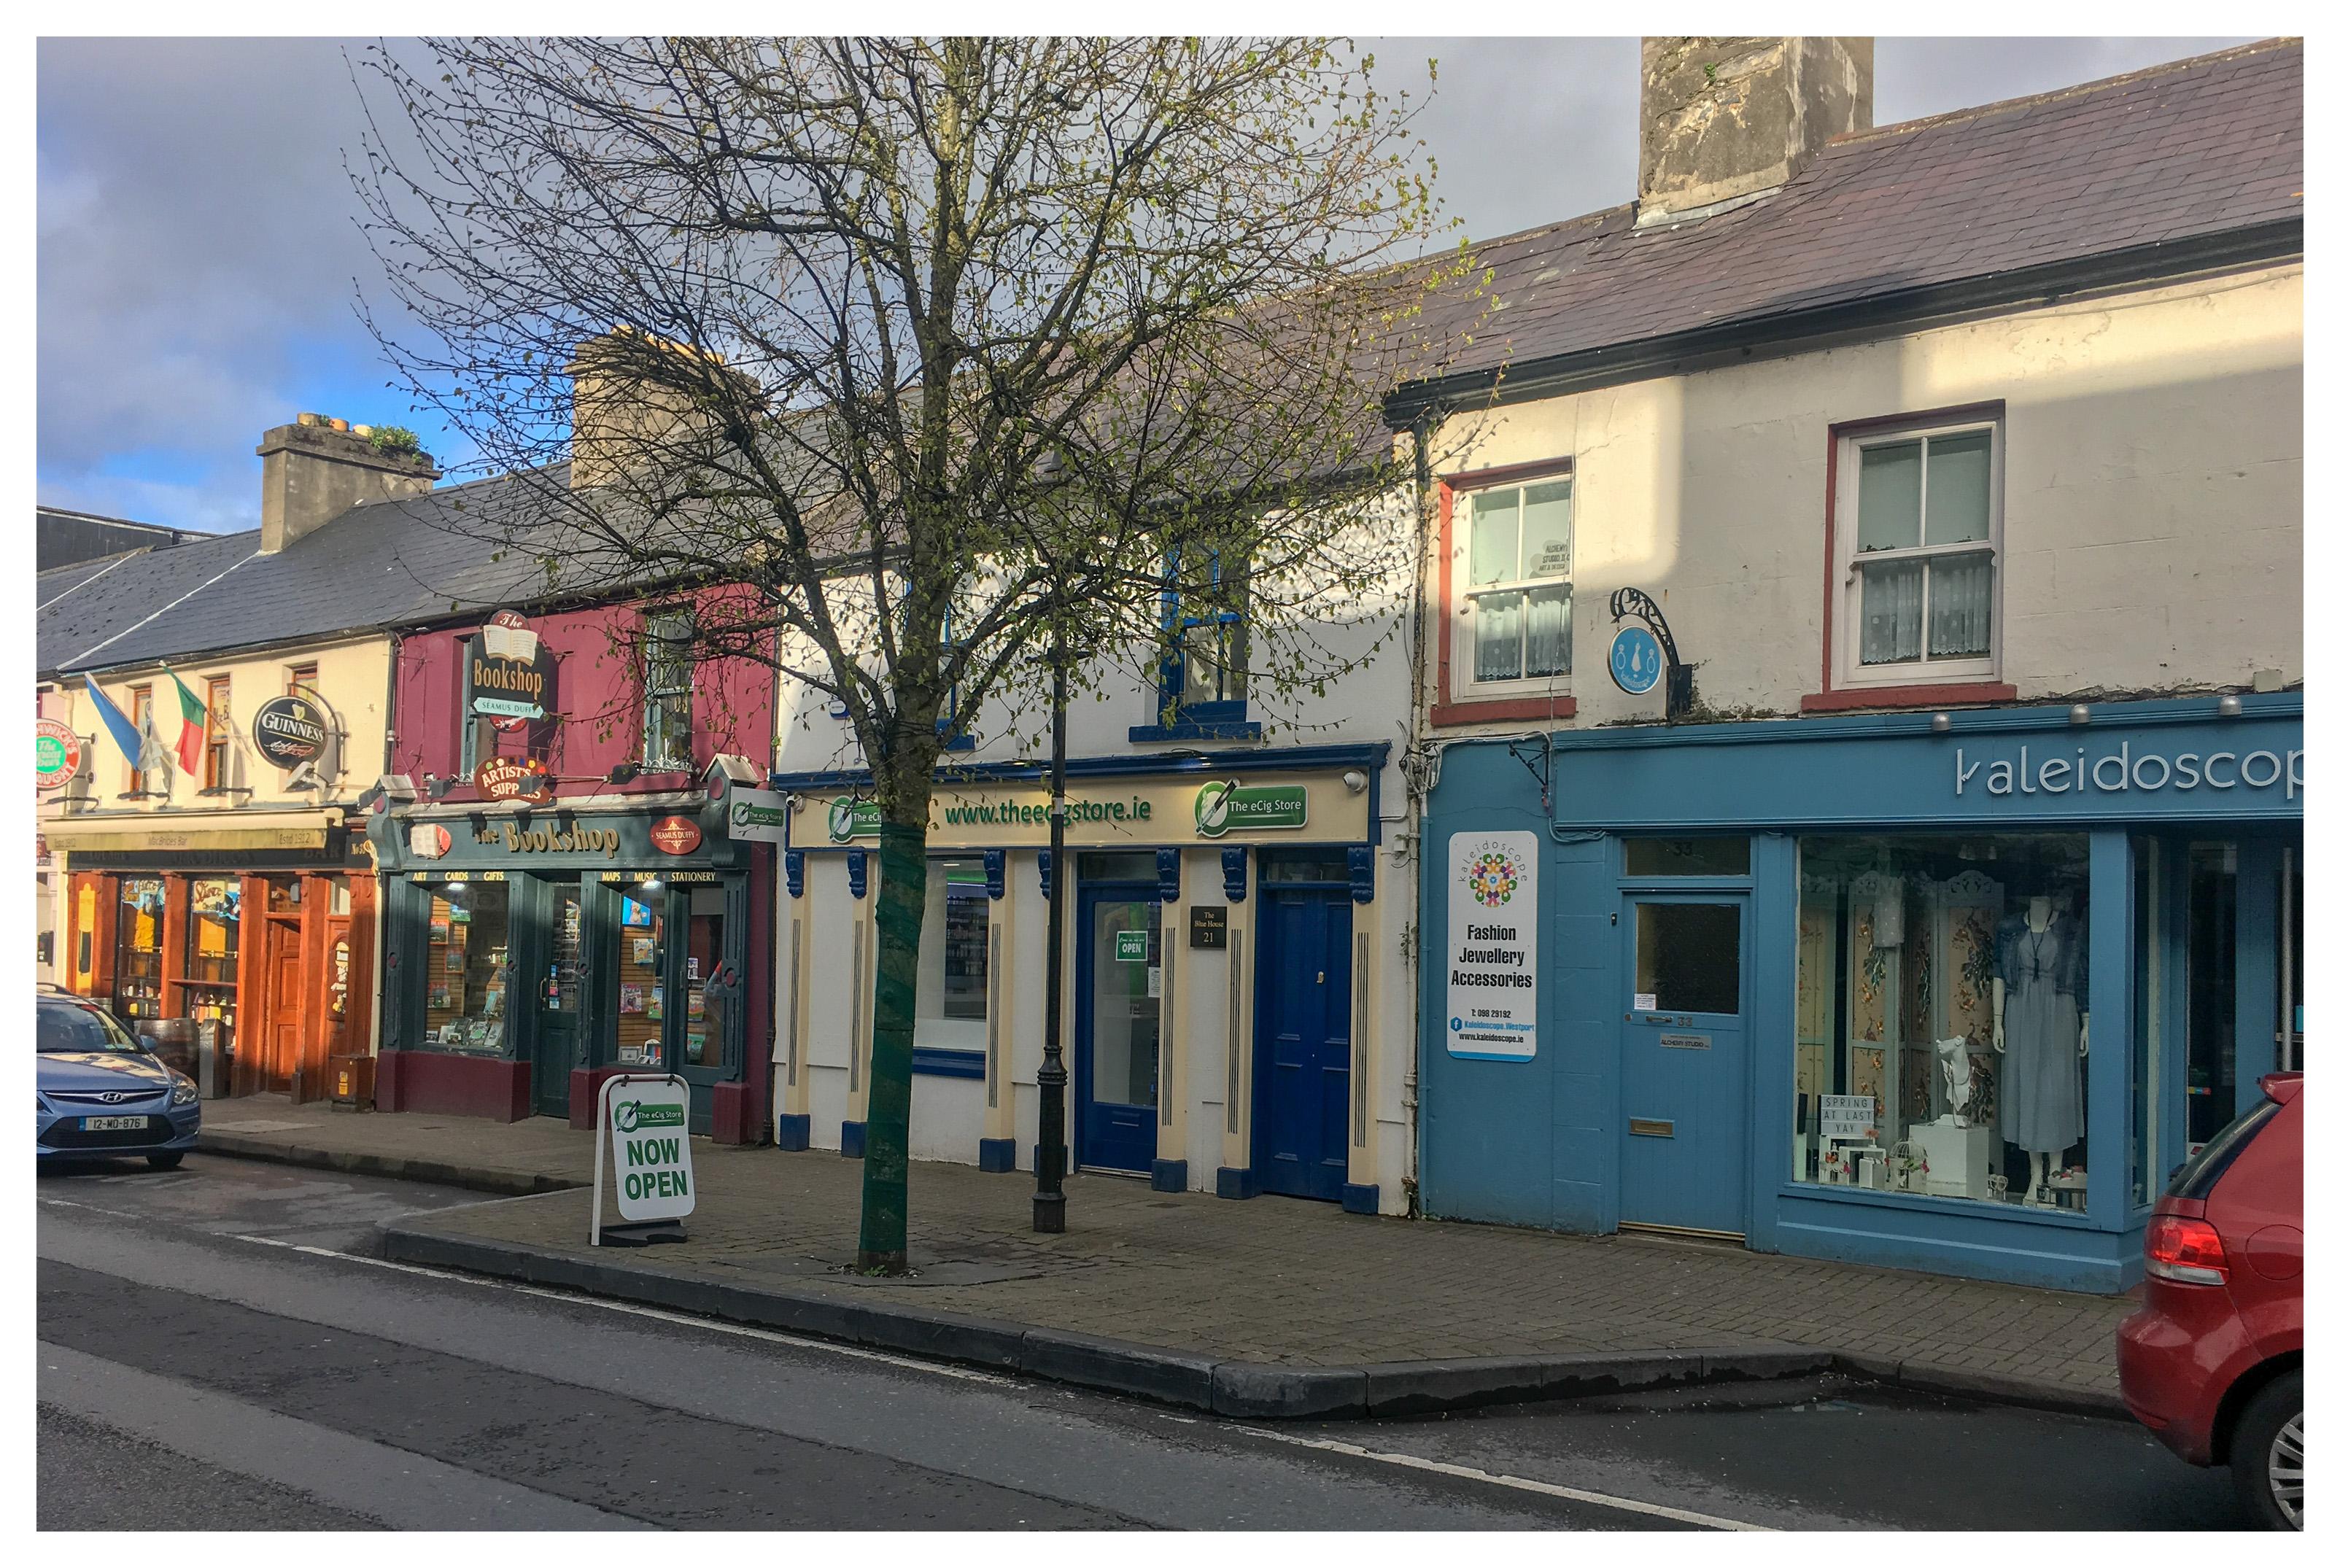 Current Local Time in Westport, Ireland - uselesspenguin.co.uk